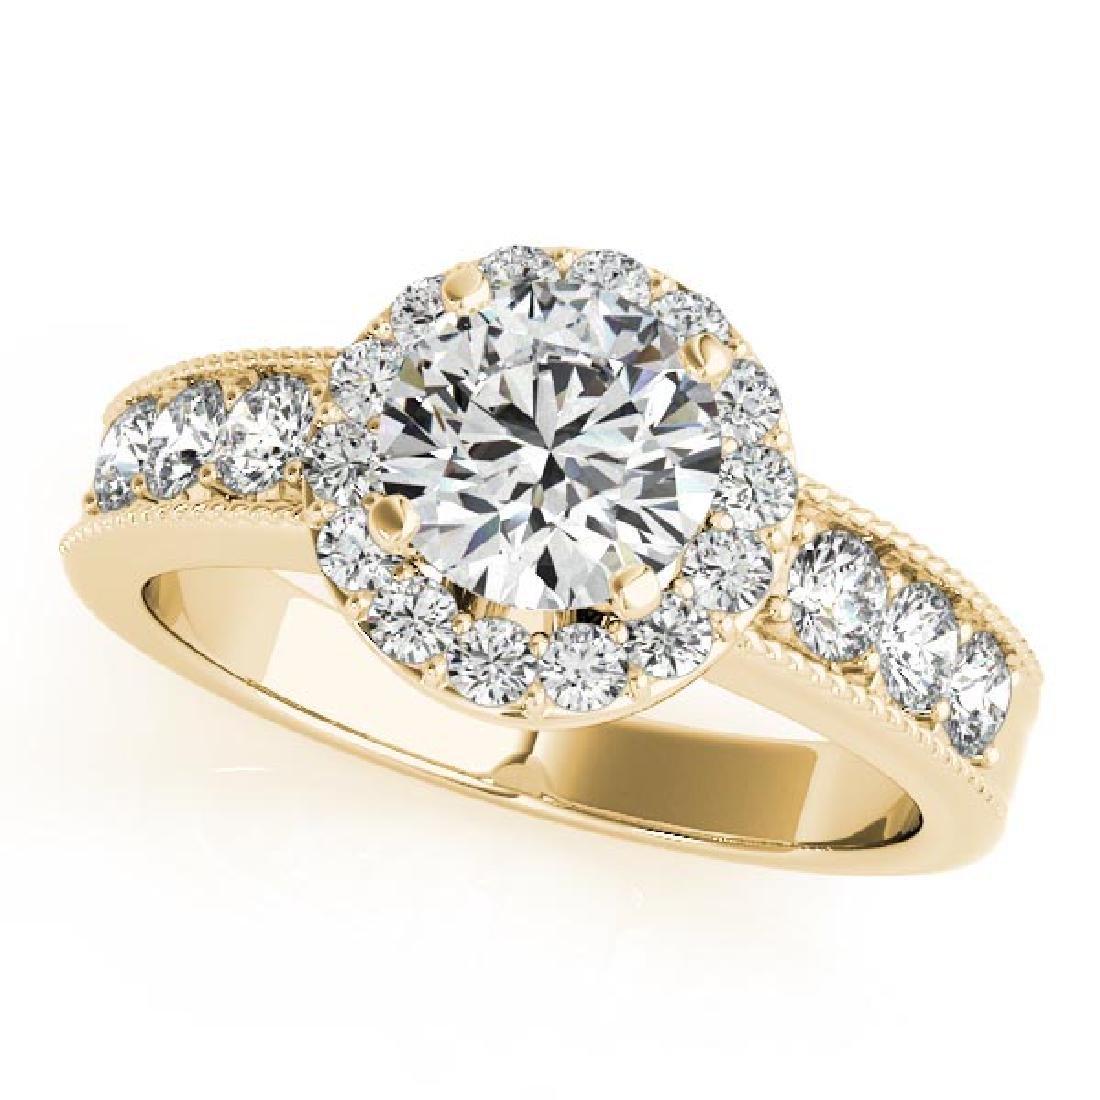 CERTIFIED 18K YELLOW GOLD 1.70 CT G-H/VS-SI1 DIAMOND HA